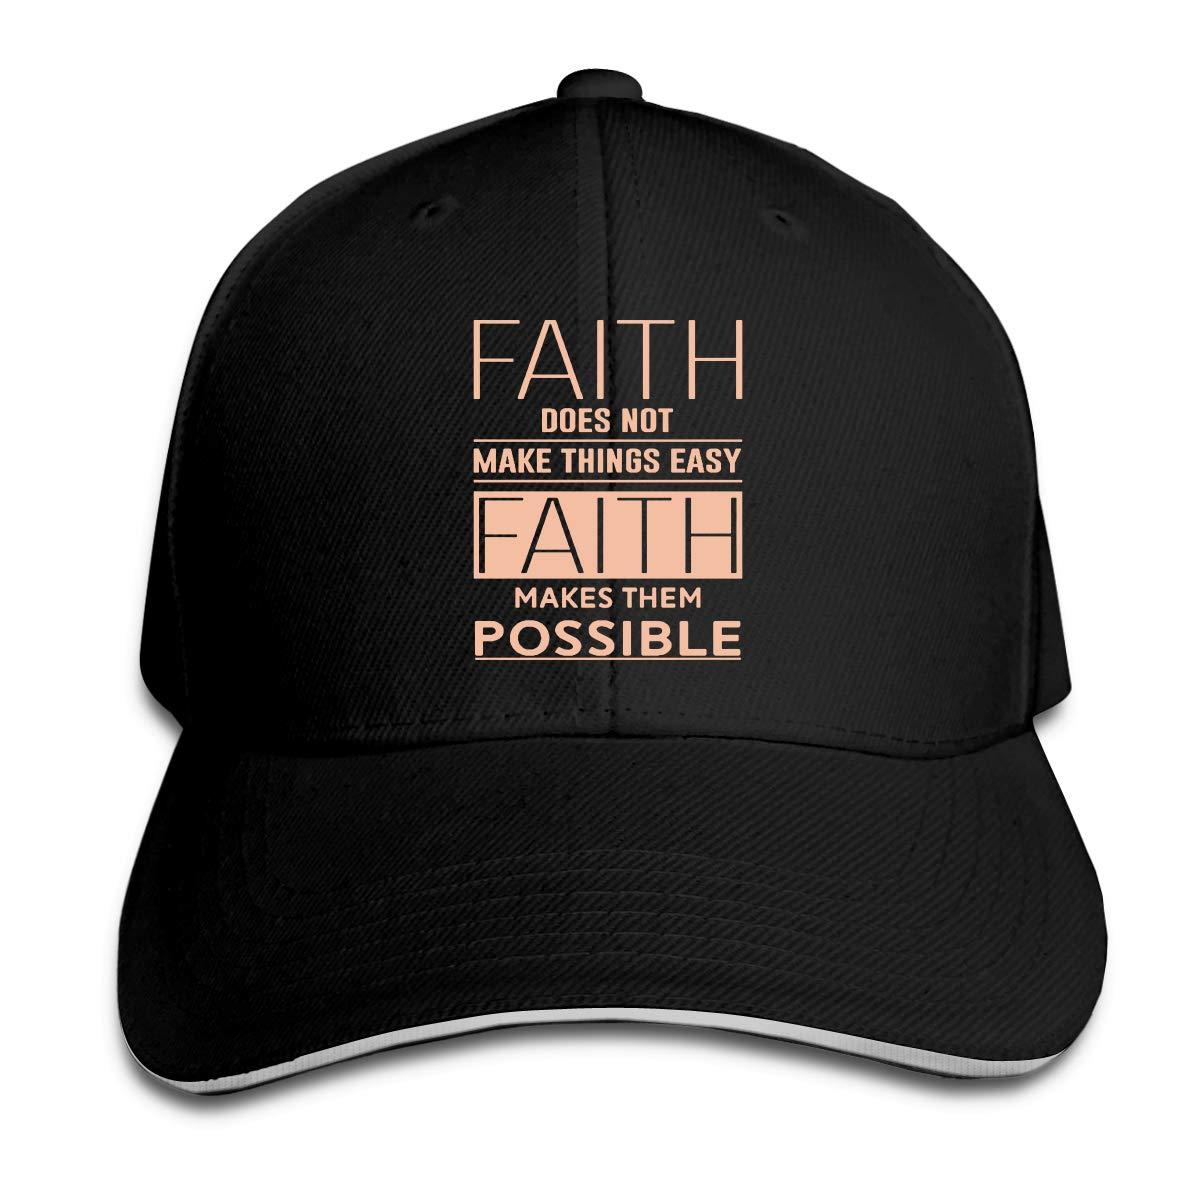 Faith Makes Things Possible Bible Verse Outdoor Snapback Sandwich Cap Adjustable Baseball Hat Street Rapper Hat